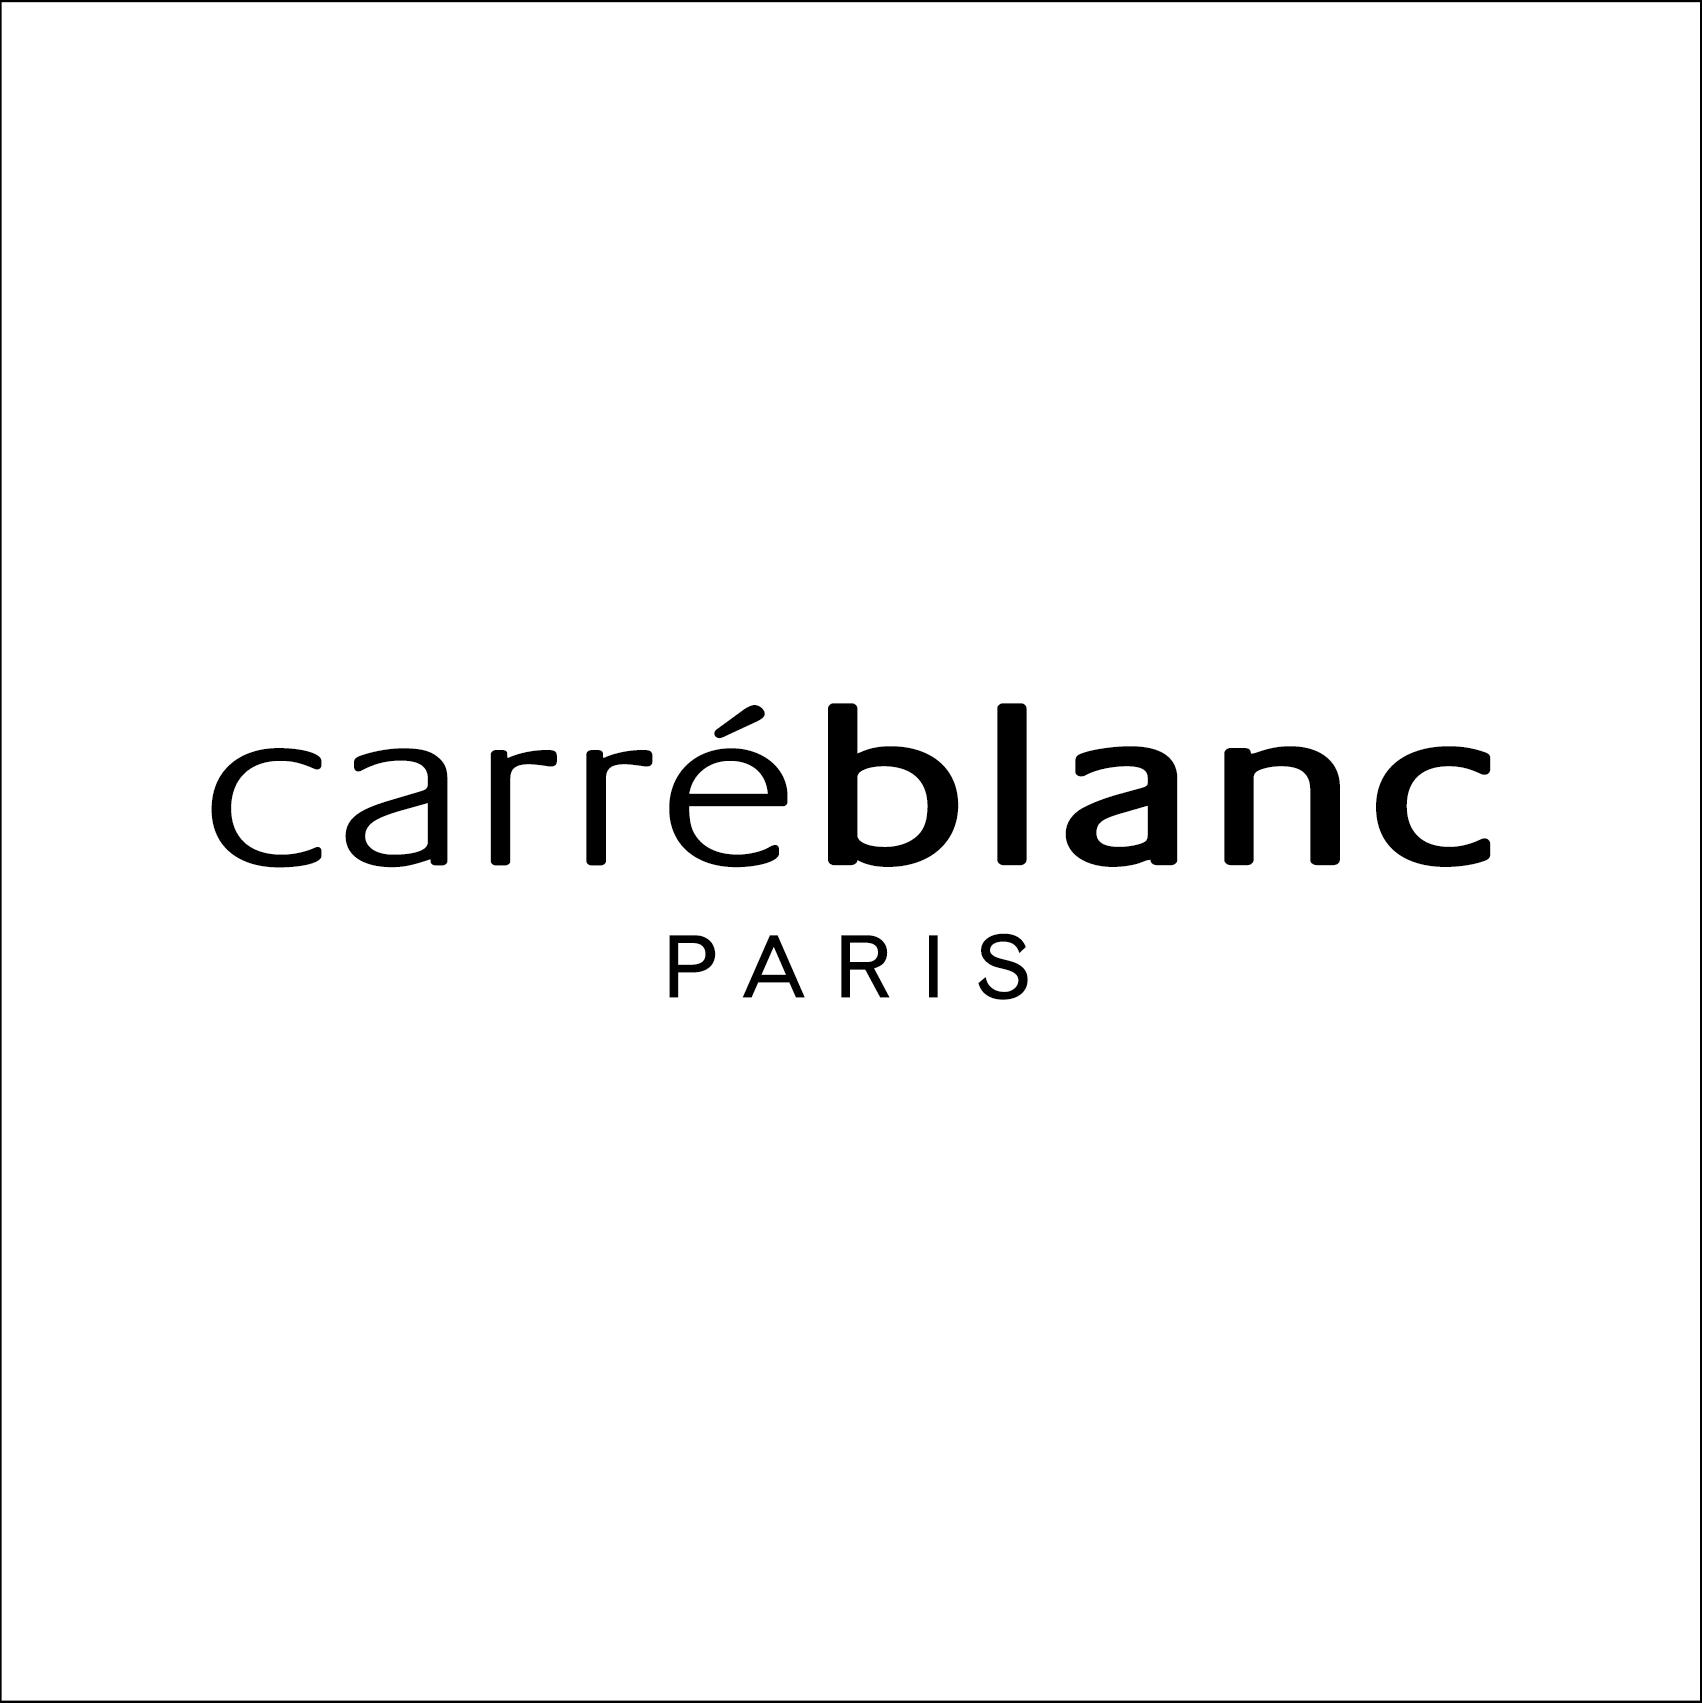 CARRE BLANC